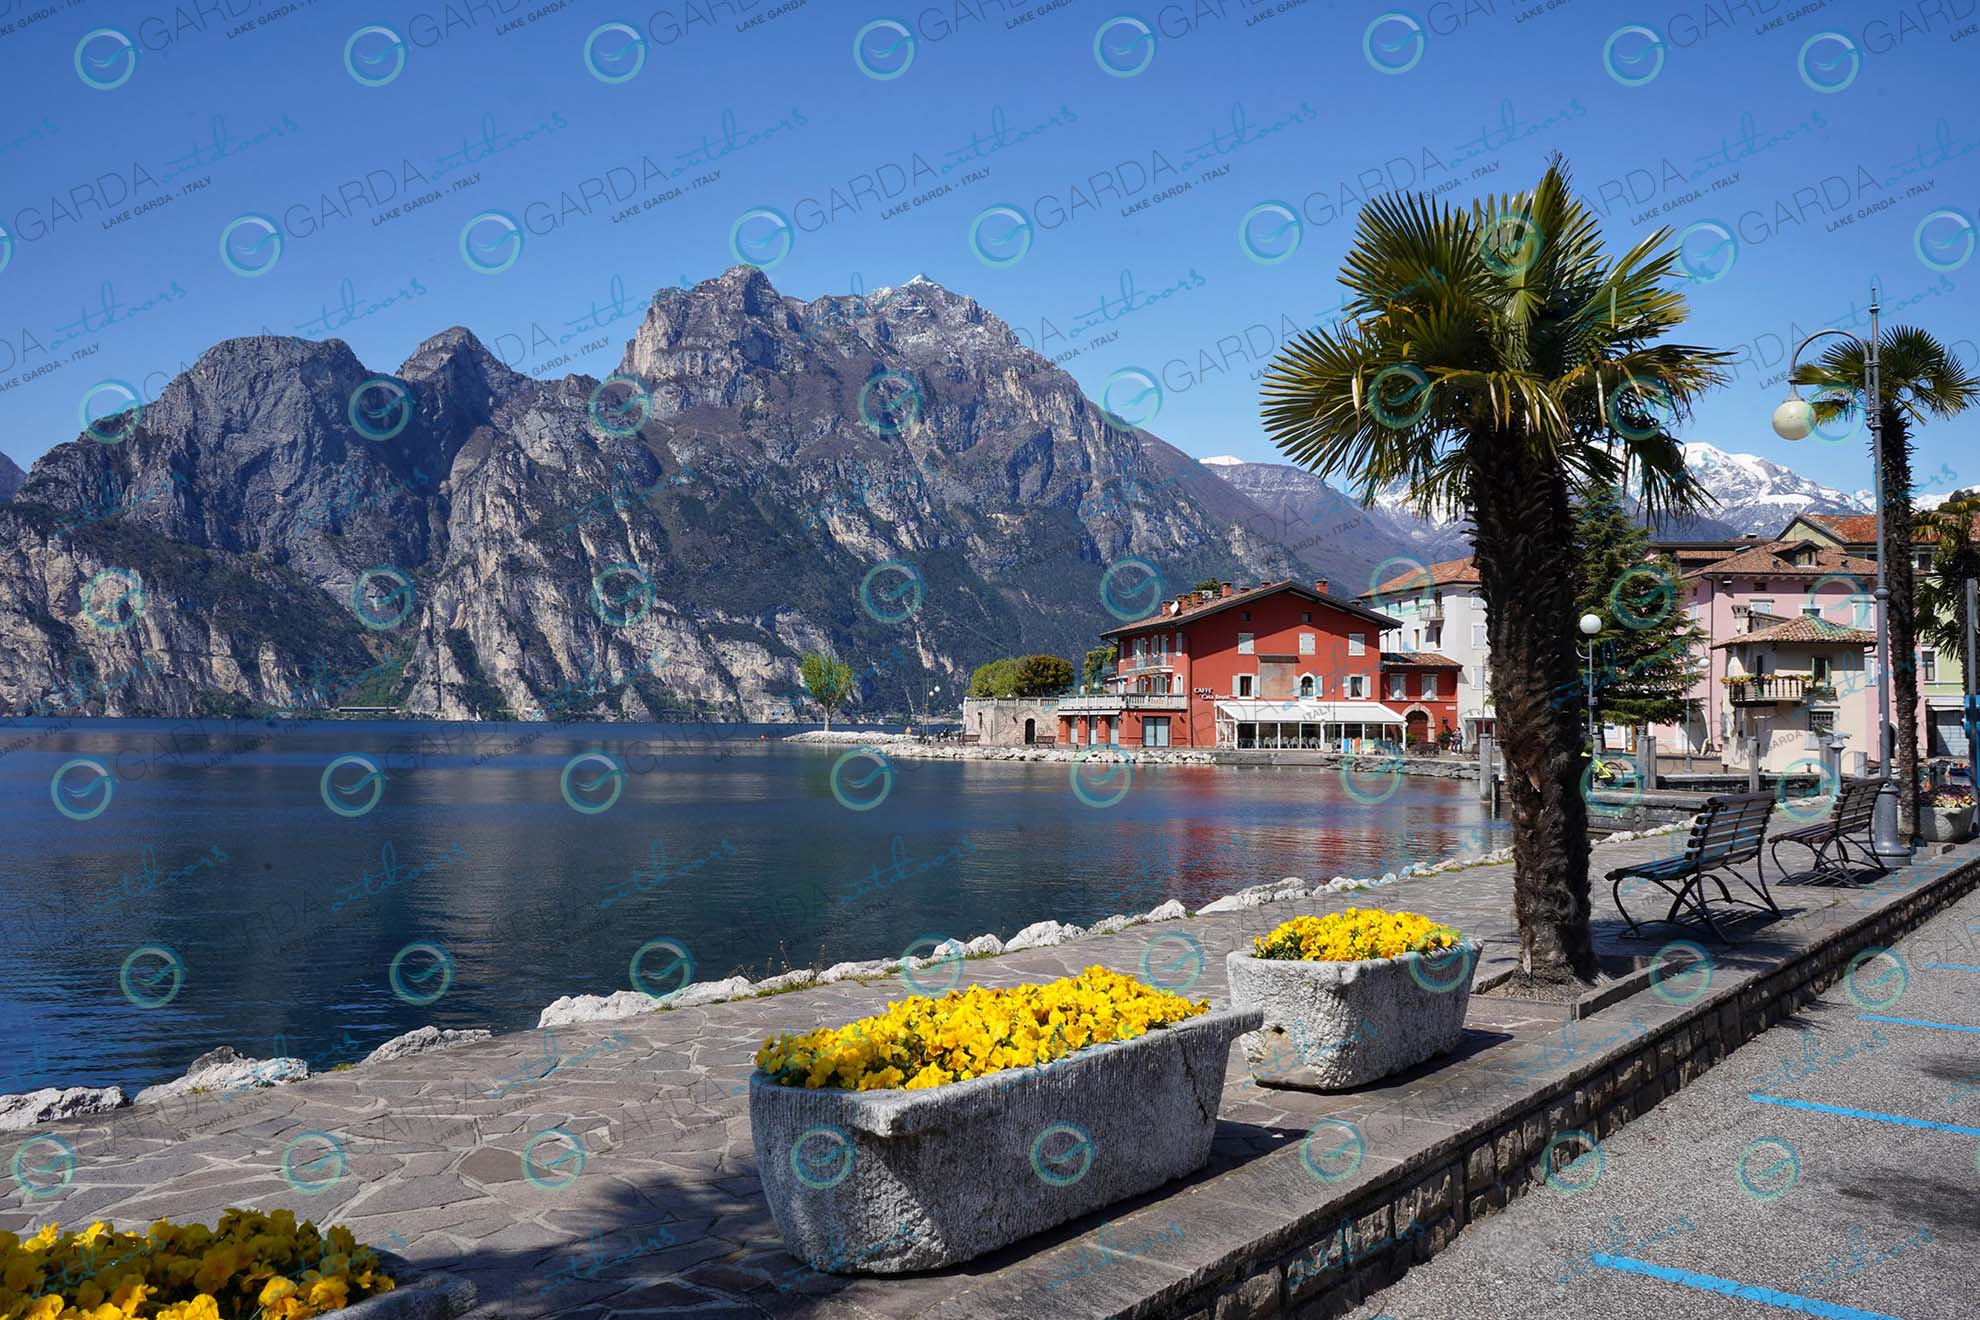 Torbole sul Garda - flowers and palms